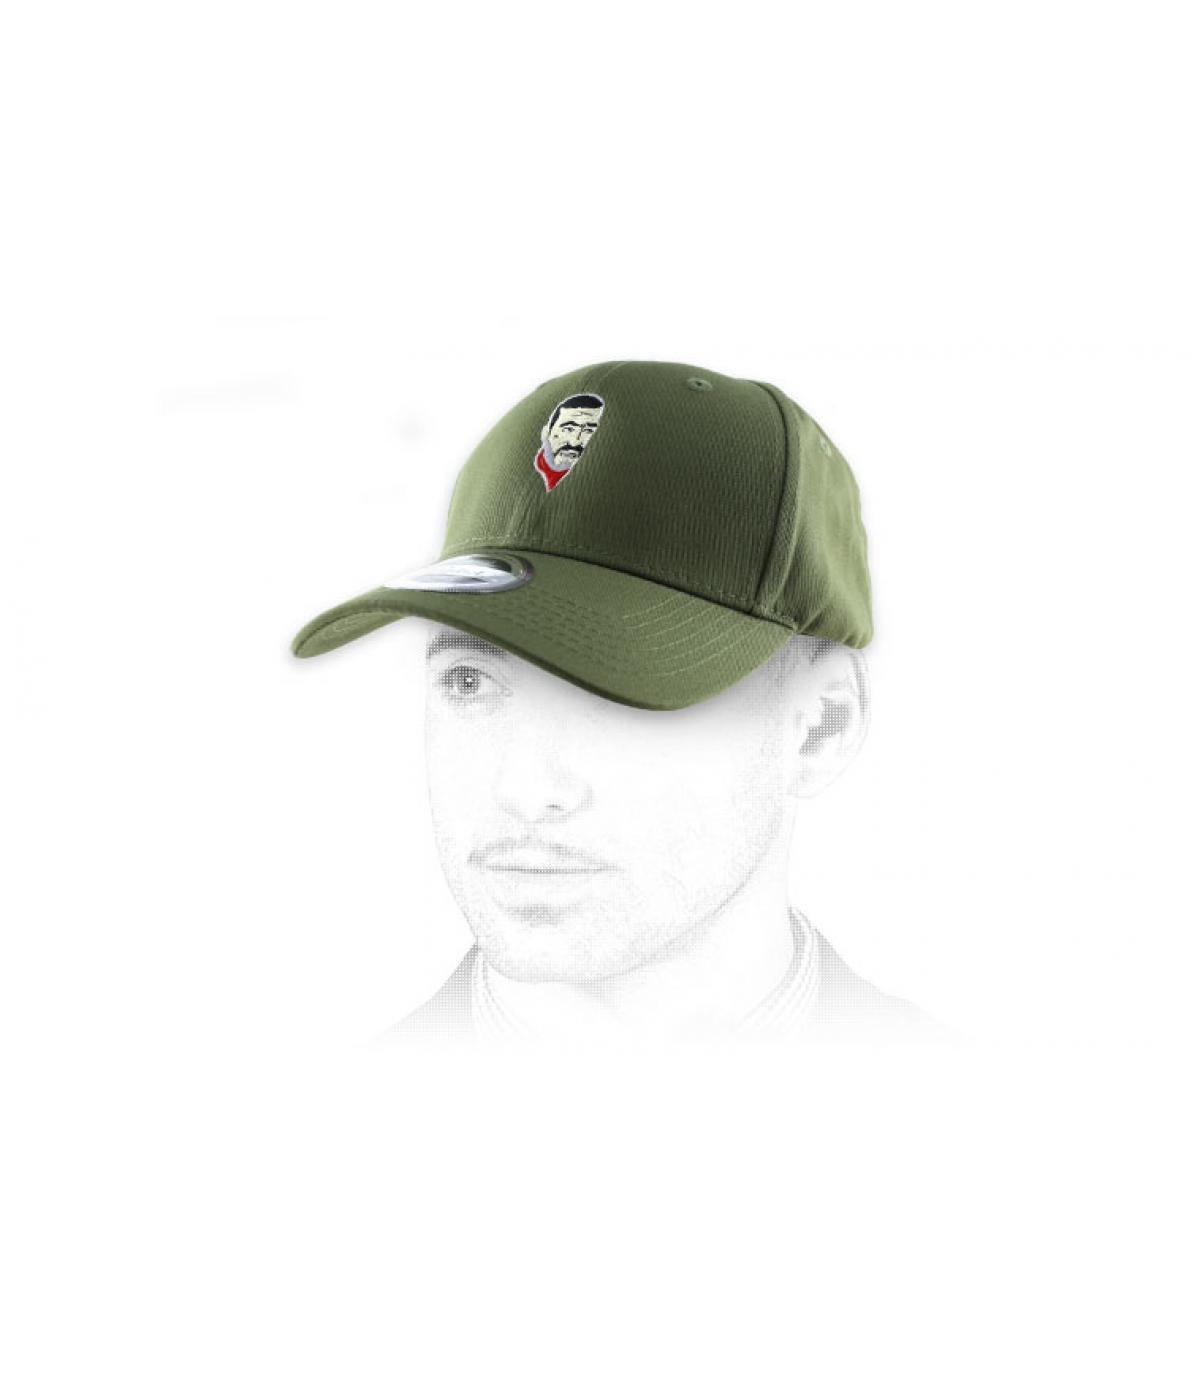 curva gorra verde Negan